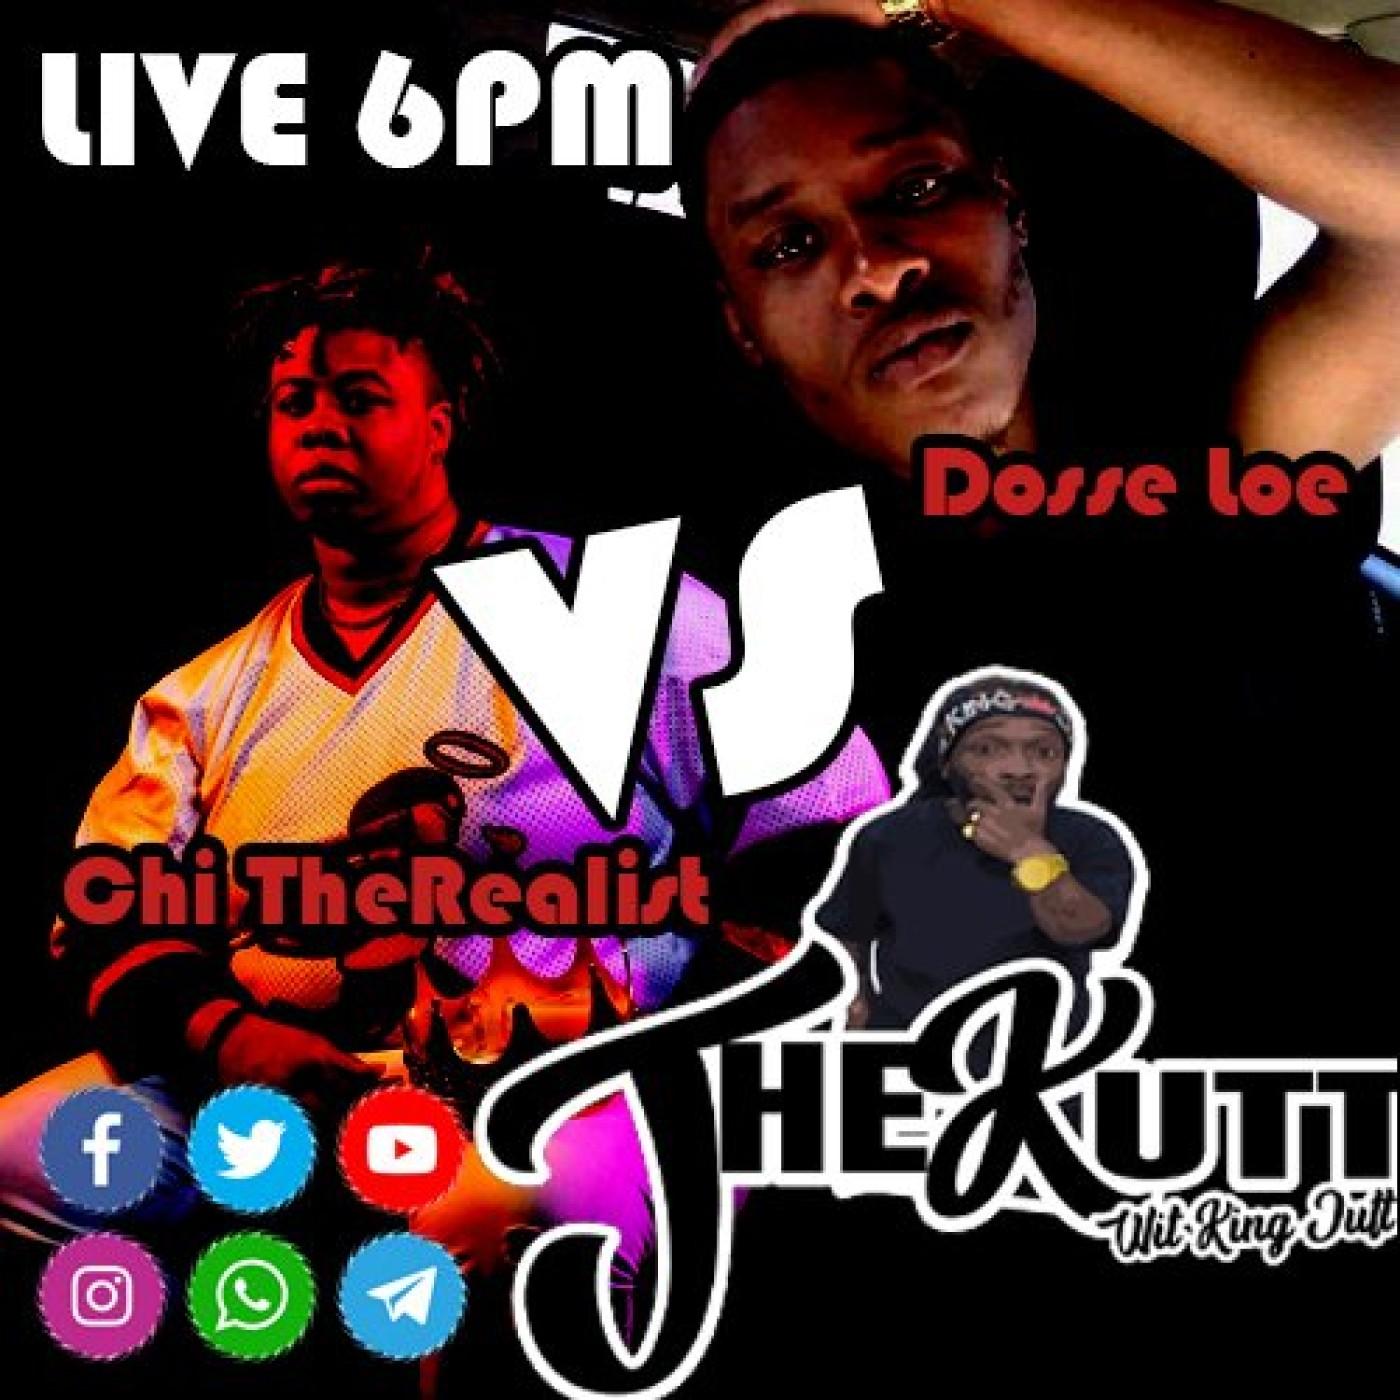 "The Kutt wit King Jutt Episode 17 1st EVER Verzus Battle Chi TheRealist vs Dosseh Loe"""